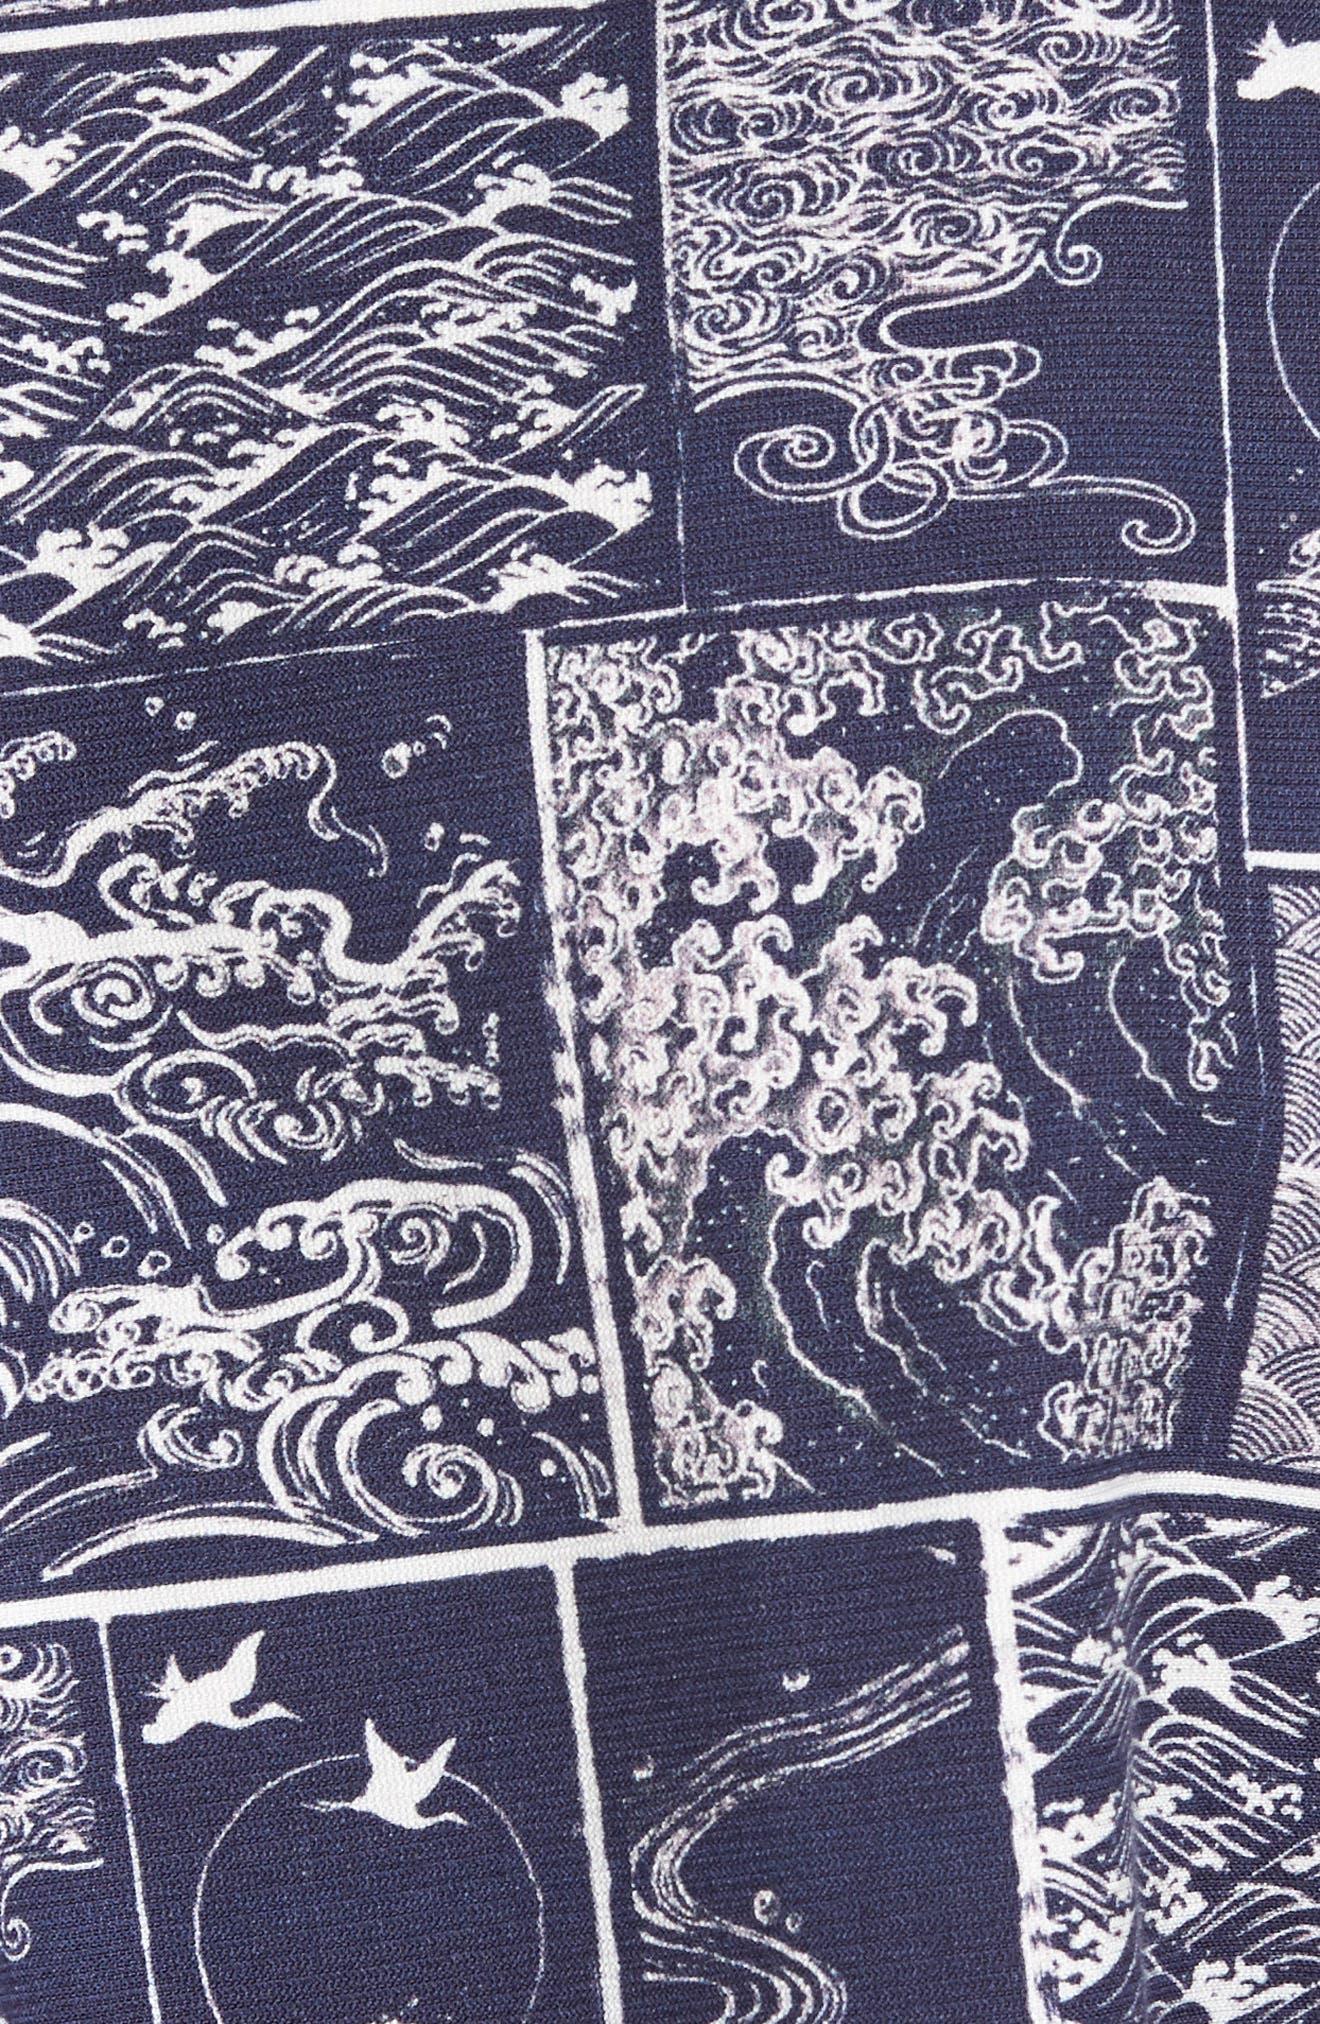 Wave Print Sport Shirt,                             Alternate thumbnail 5, color,                             Navy/ White